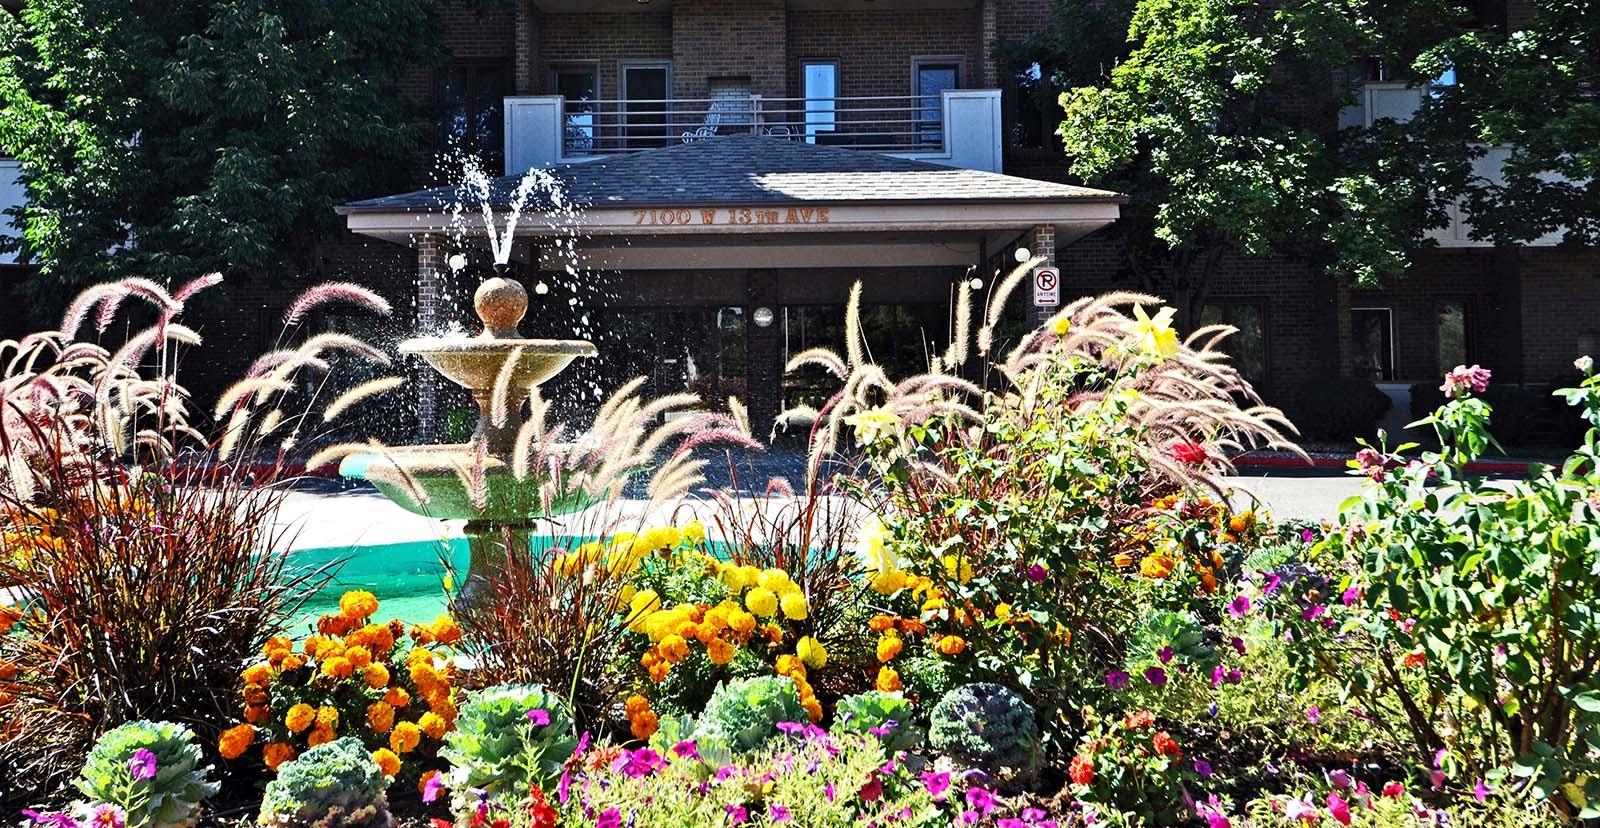 The Courtyard at Lakewood image 5